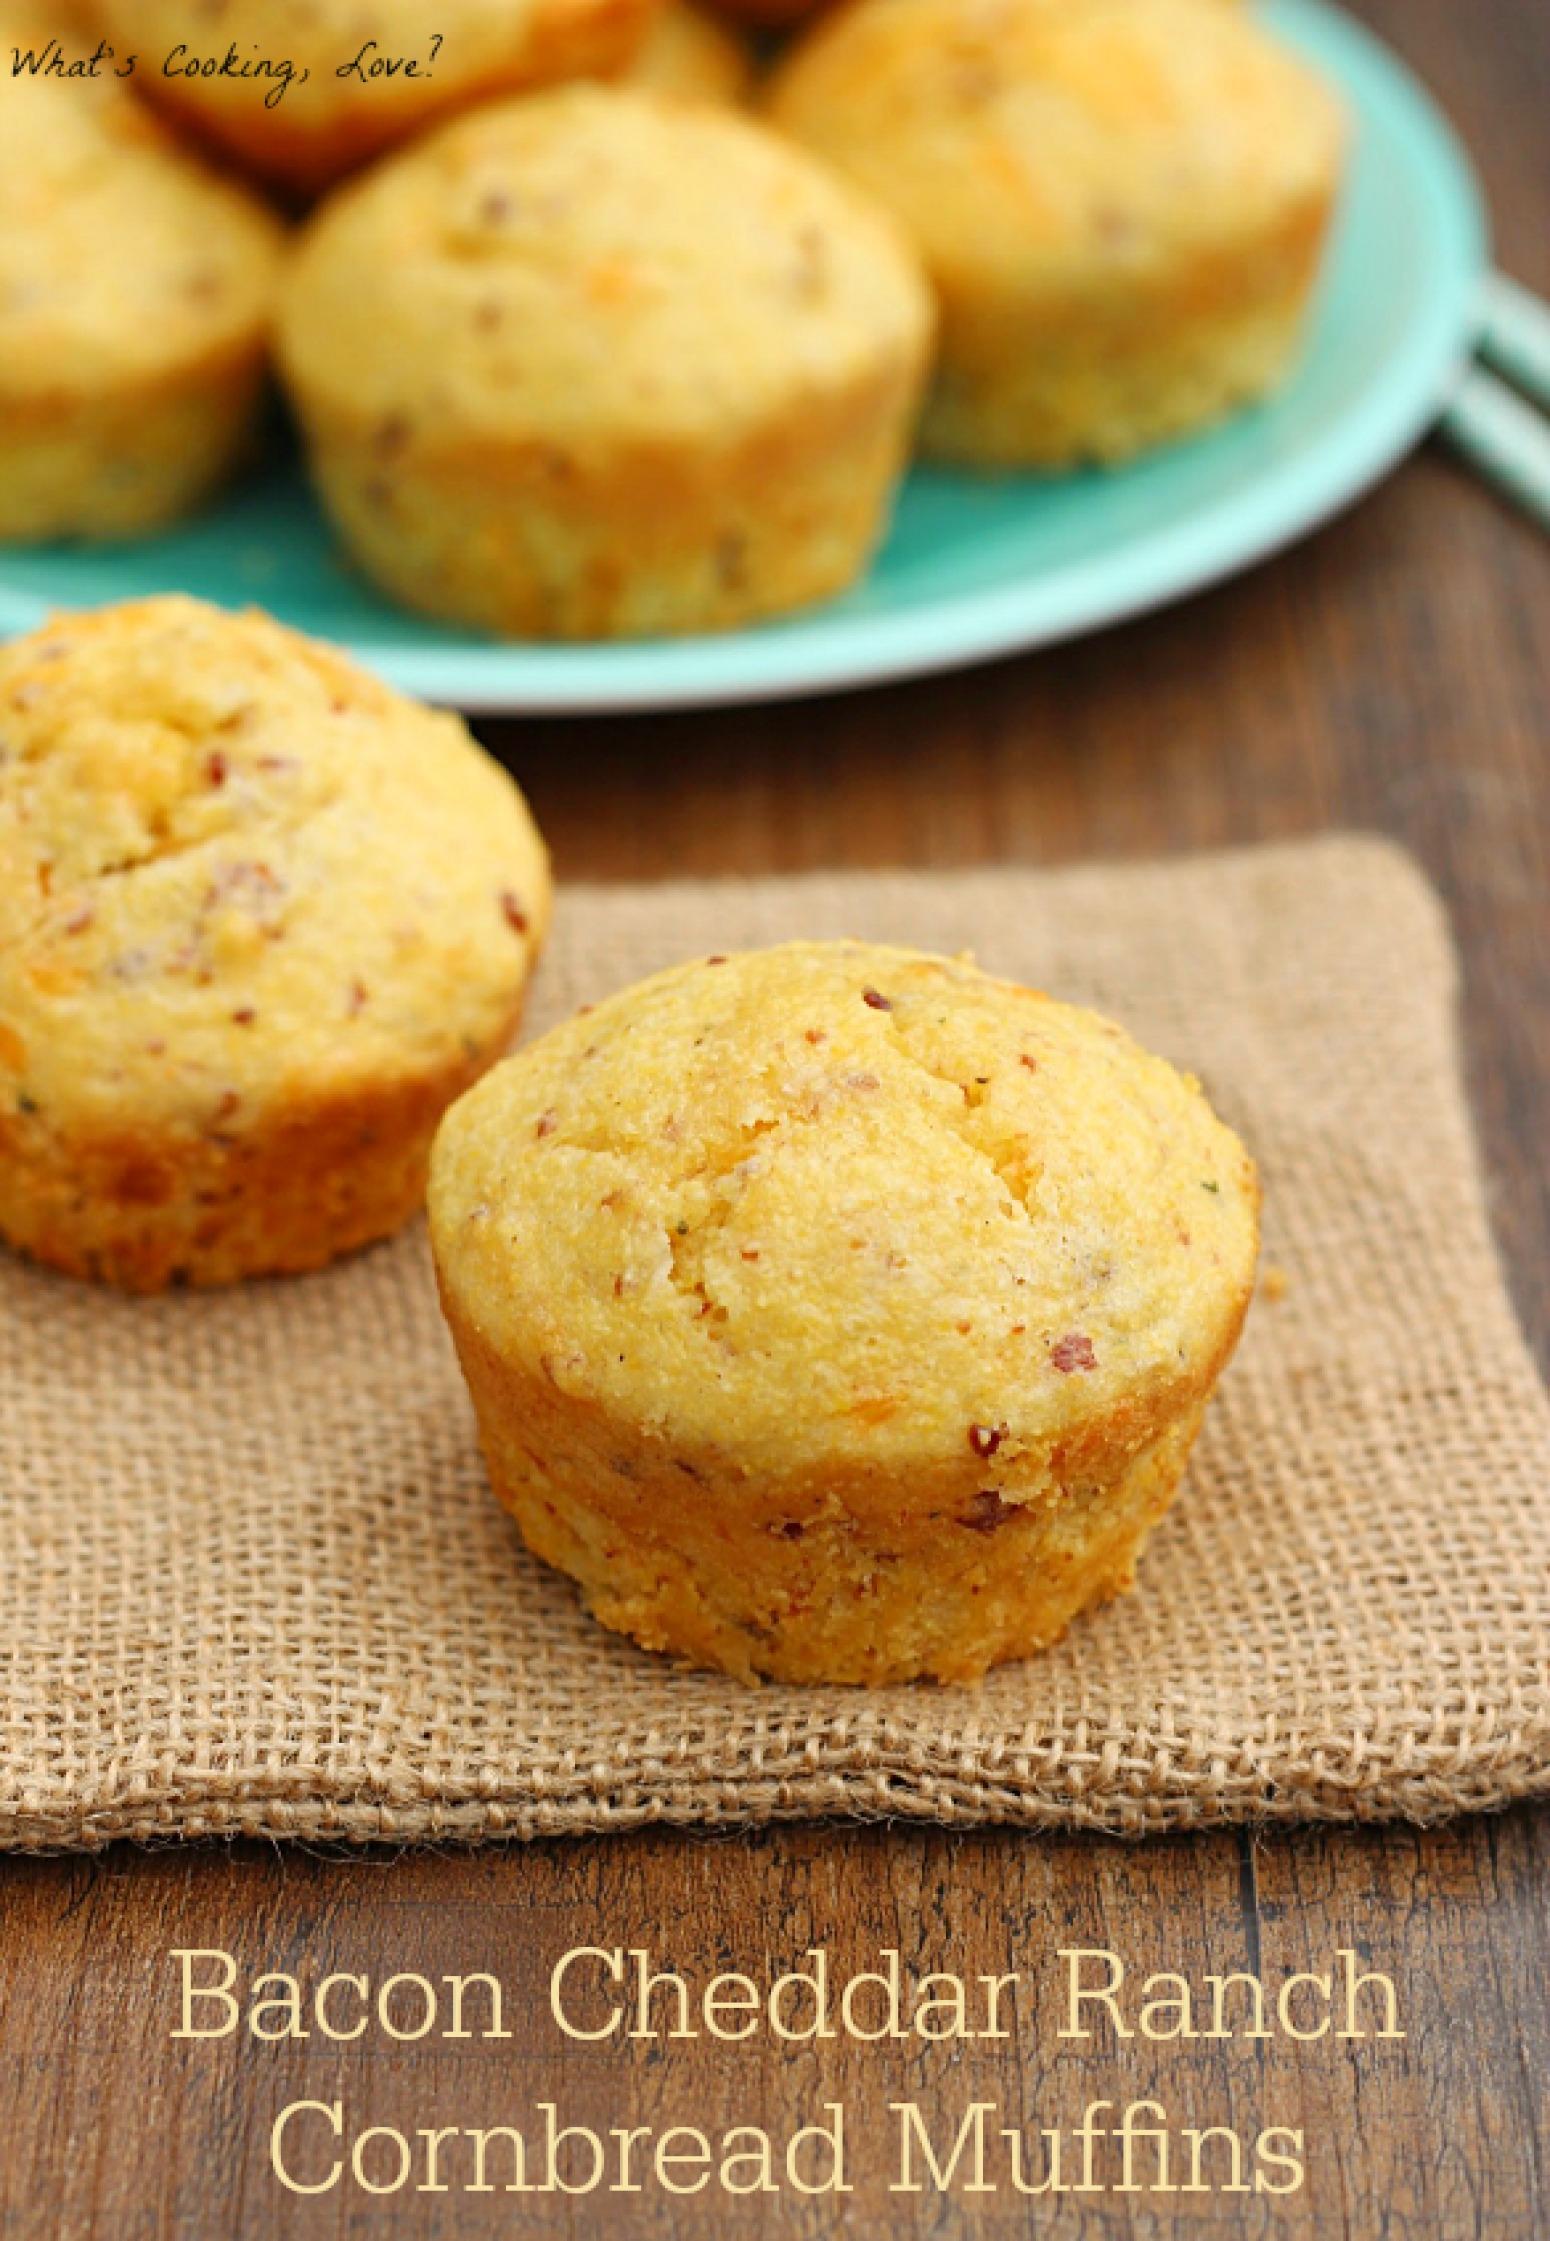 Bacon Cheddar Ranch Cornbread Muffins Recipe | Just A ...